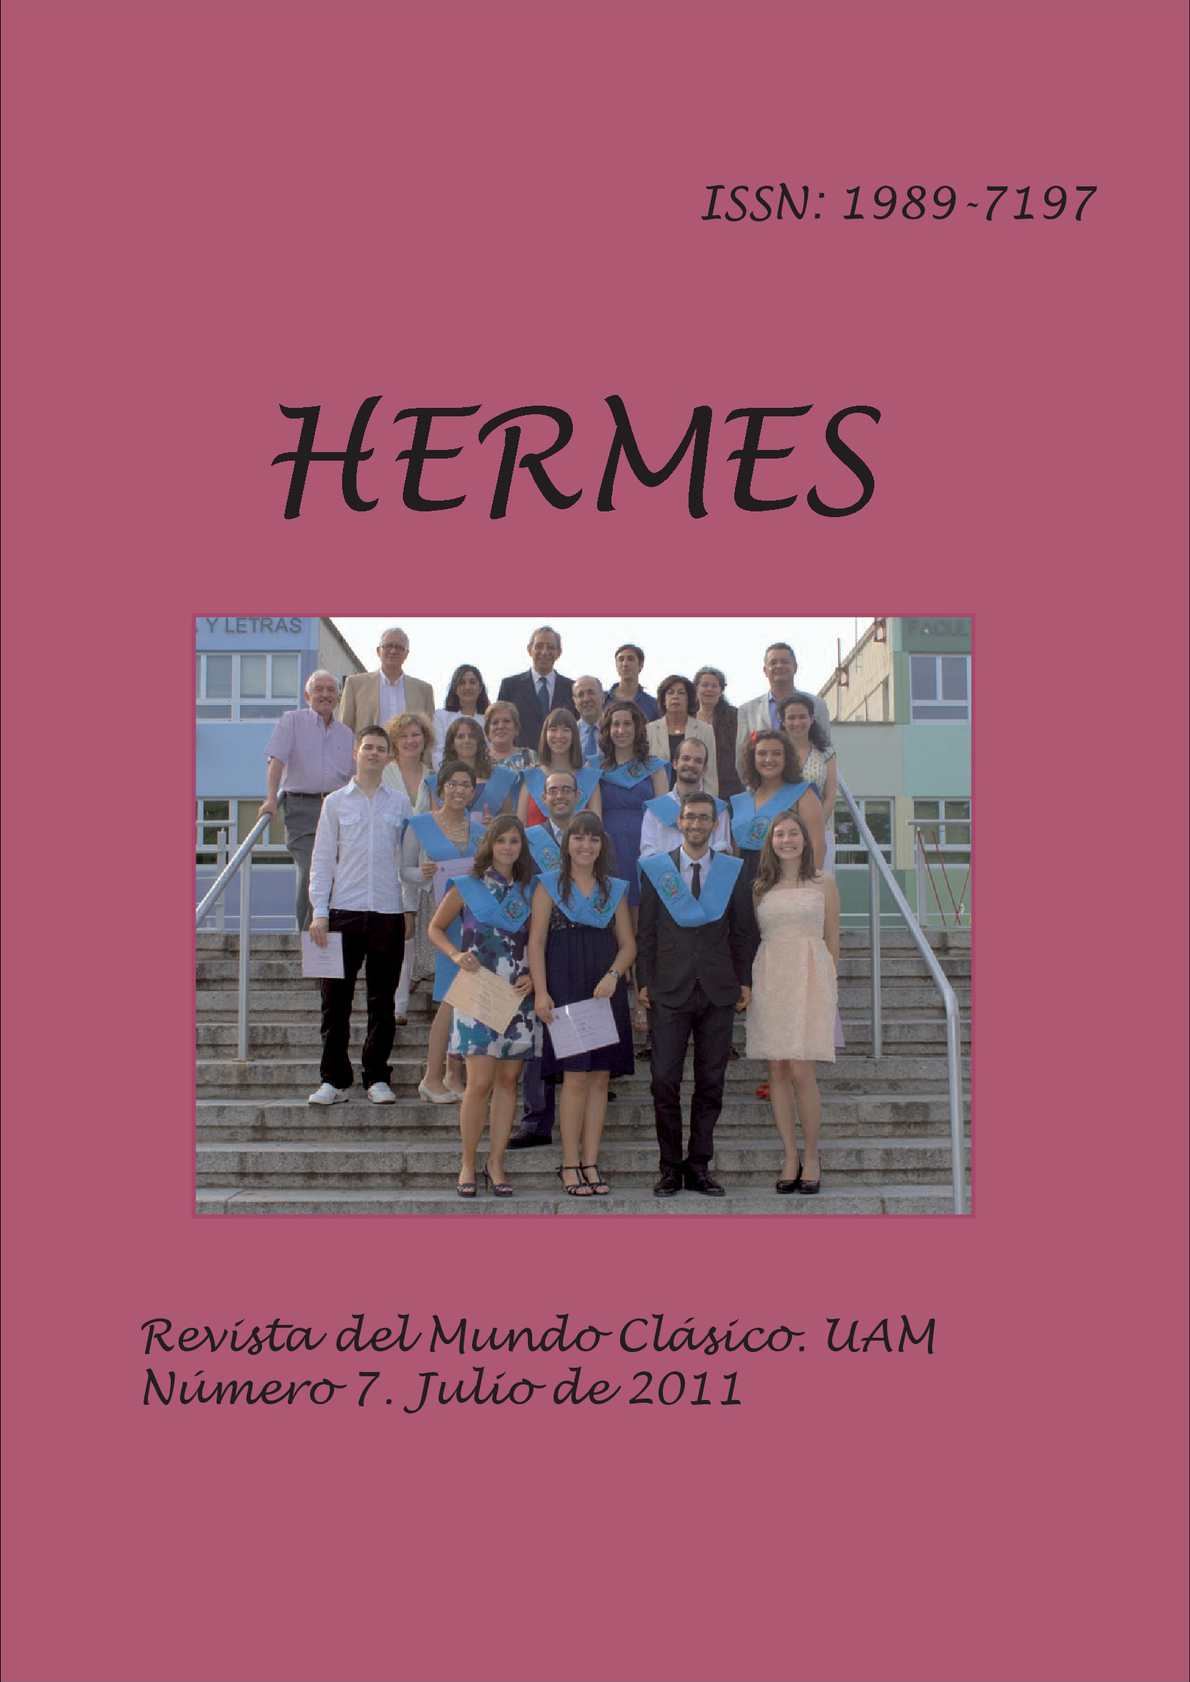 fd6951e2a9a Calaméo - Hermes 7